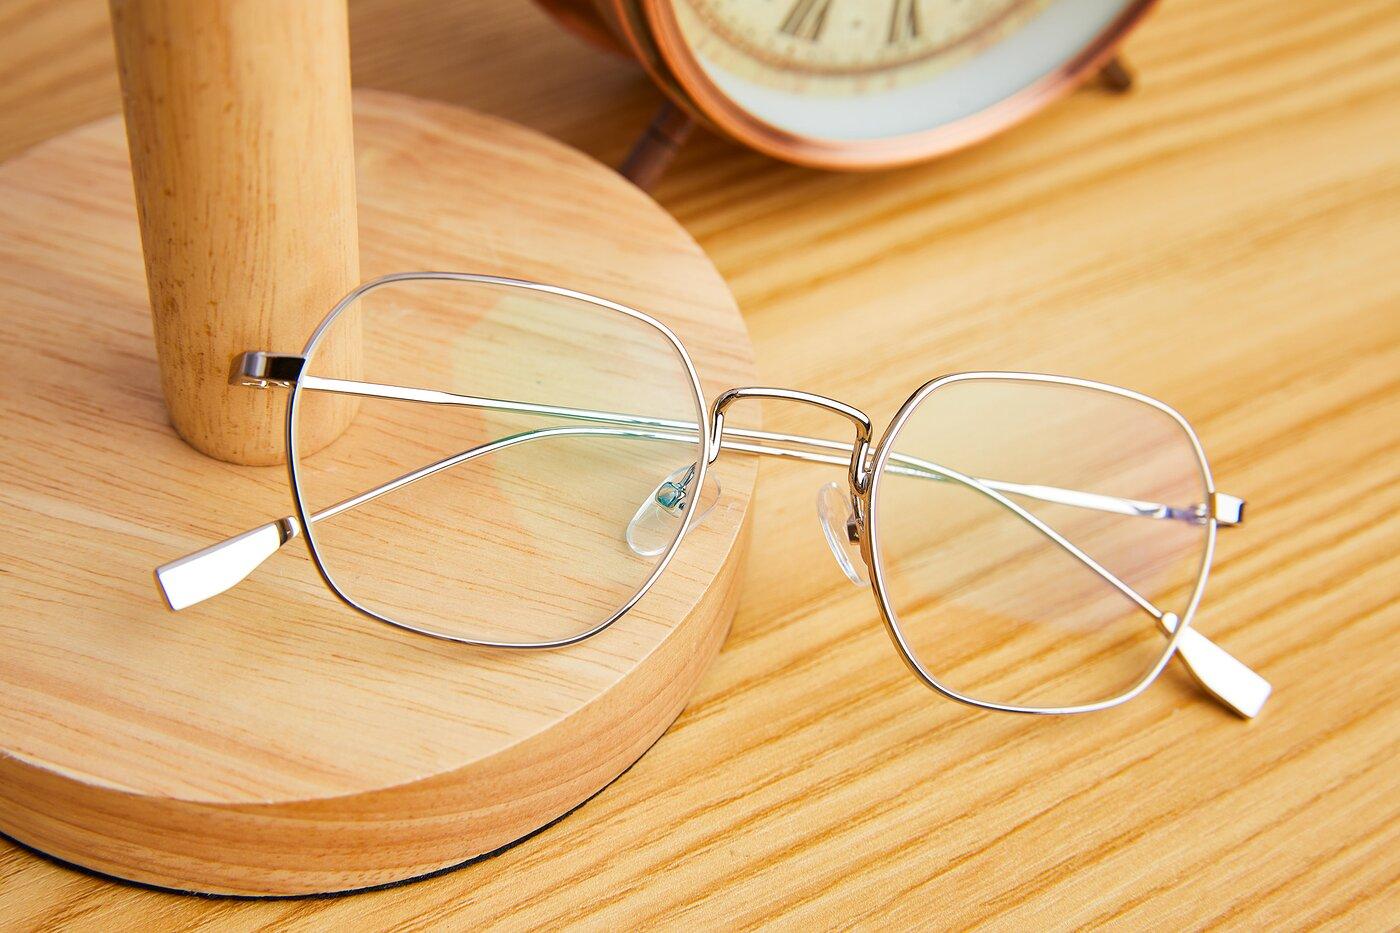 Silver Narrow Metal Geometric Eyeglasses